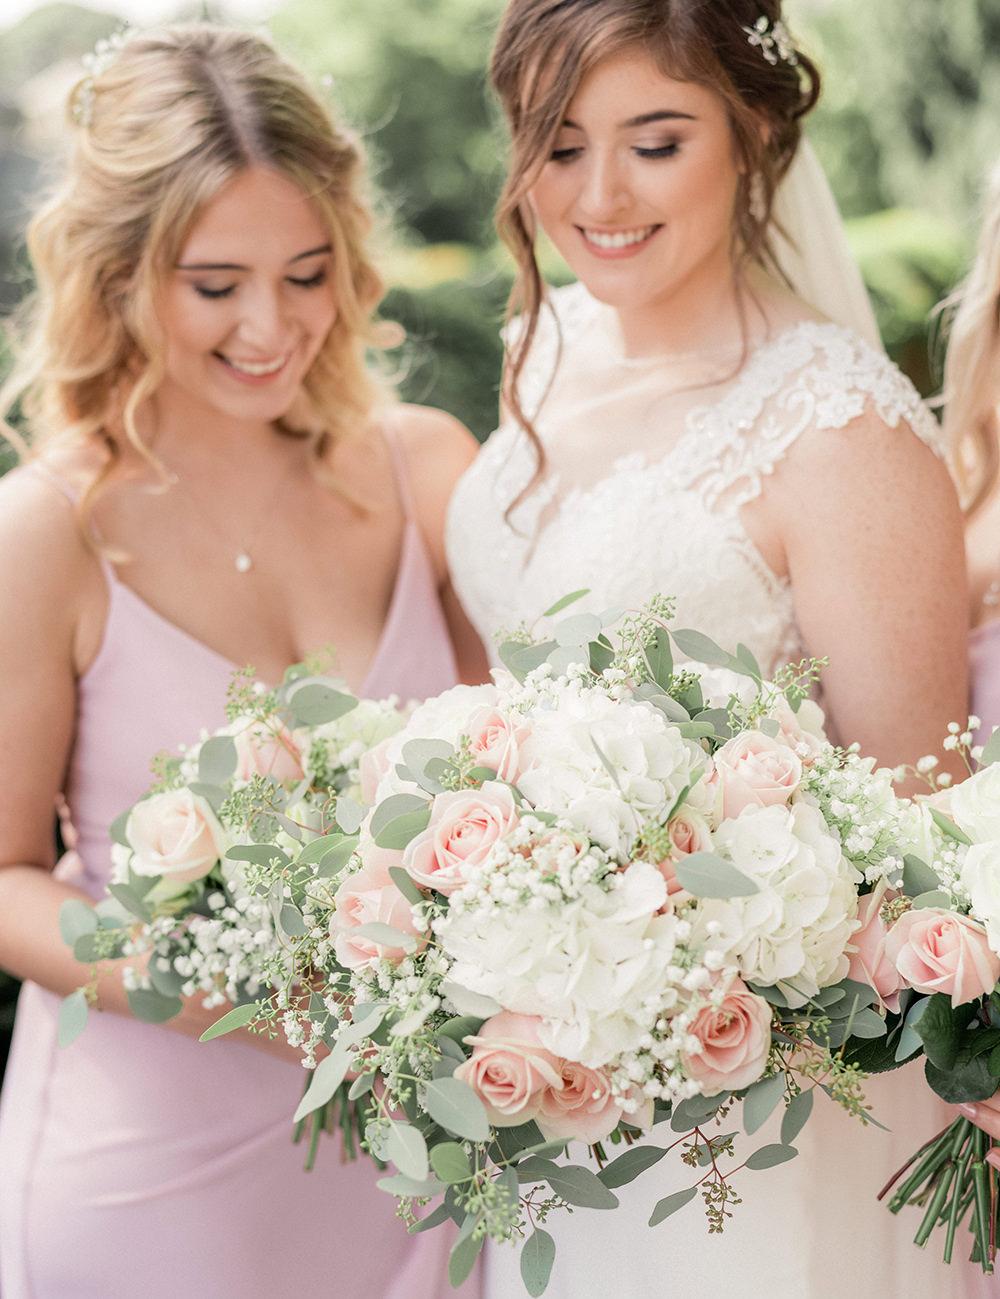 Bouquet Flowers Bride Bridal Pink Rose White Hydrangea Eucalyptus Beamish Hall Wedding Carn Patrick Photography